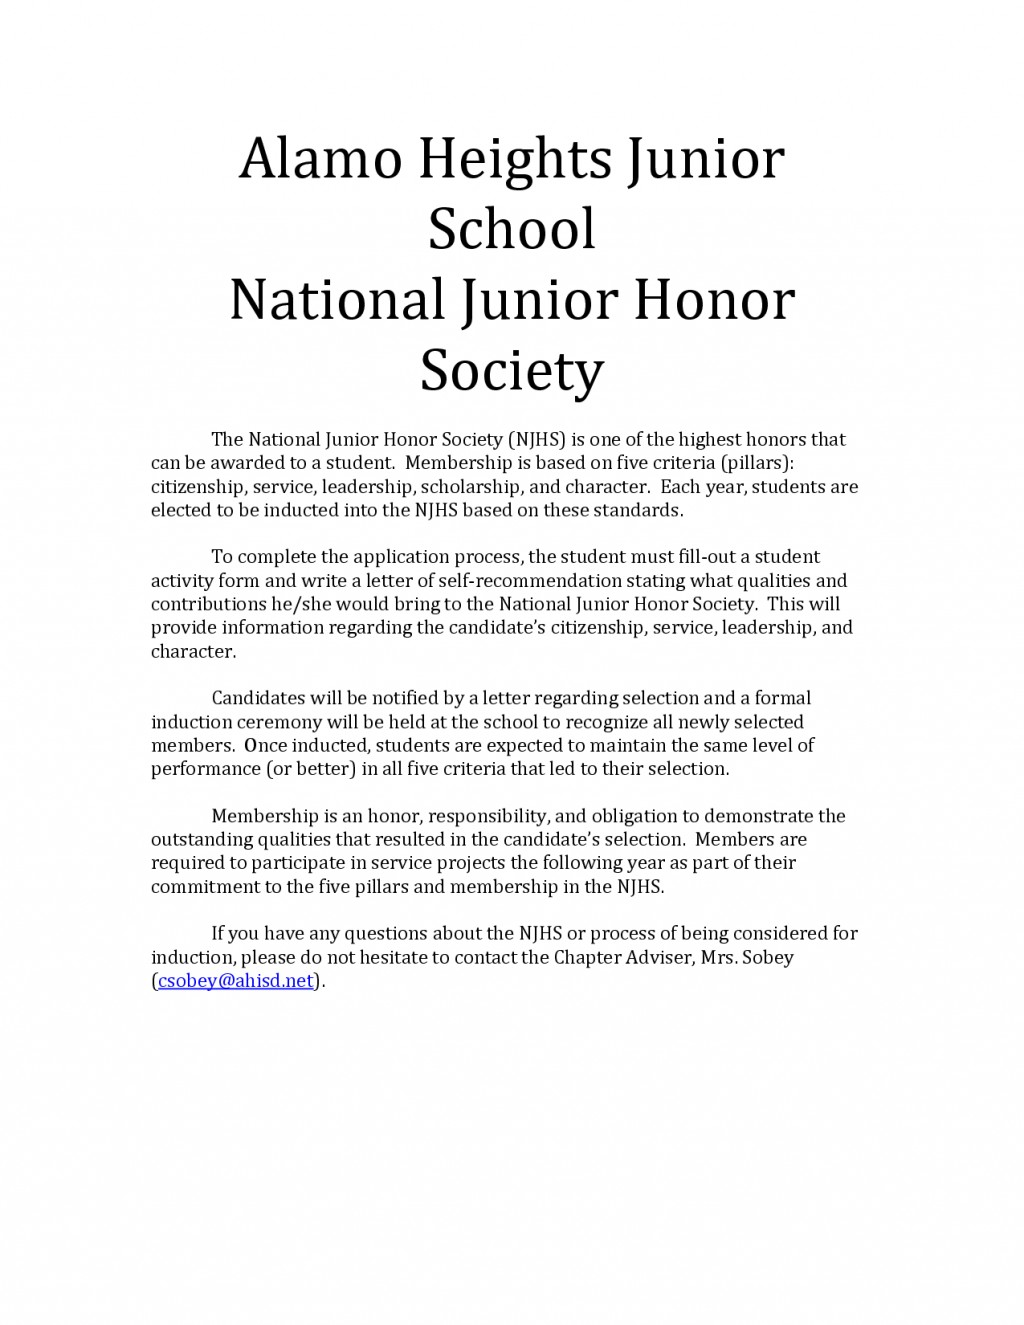 005 National Honor Society Application Essay Example Sensational Junior Ideas Examples Large